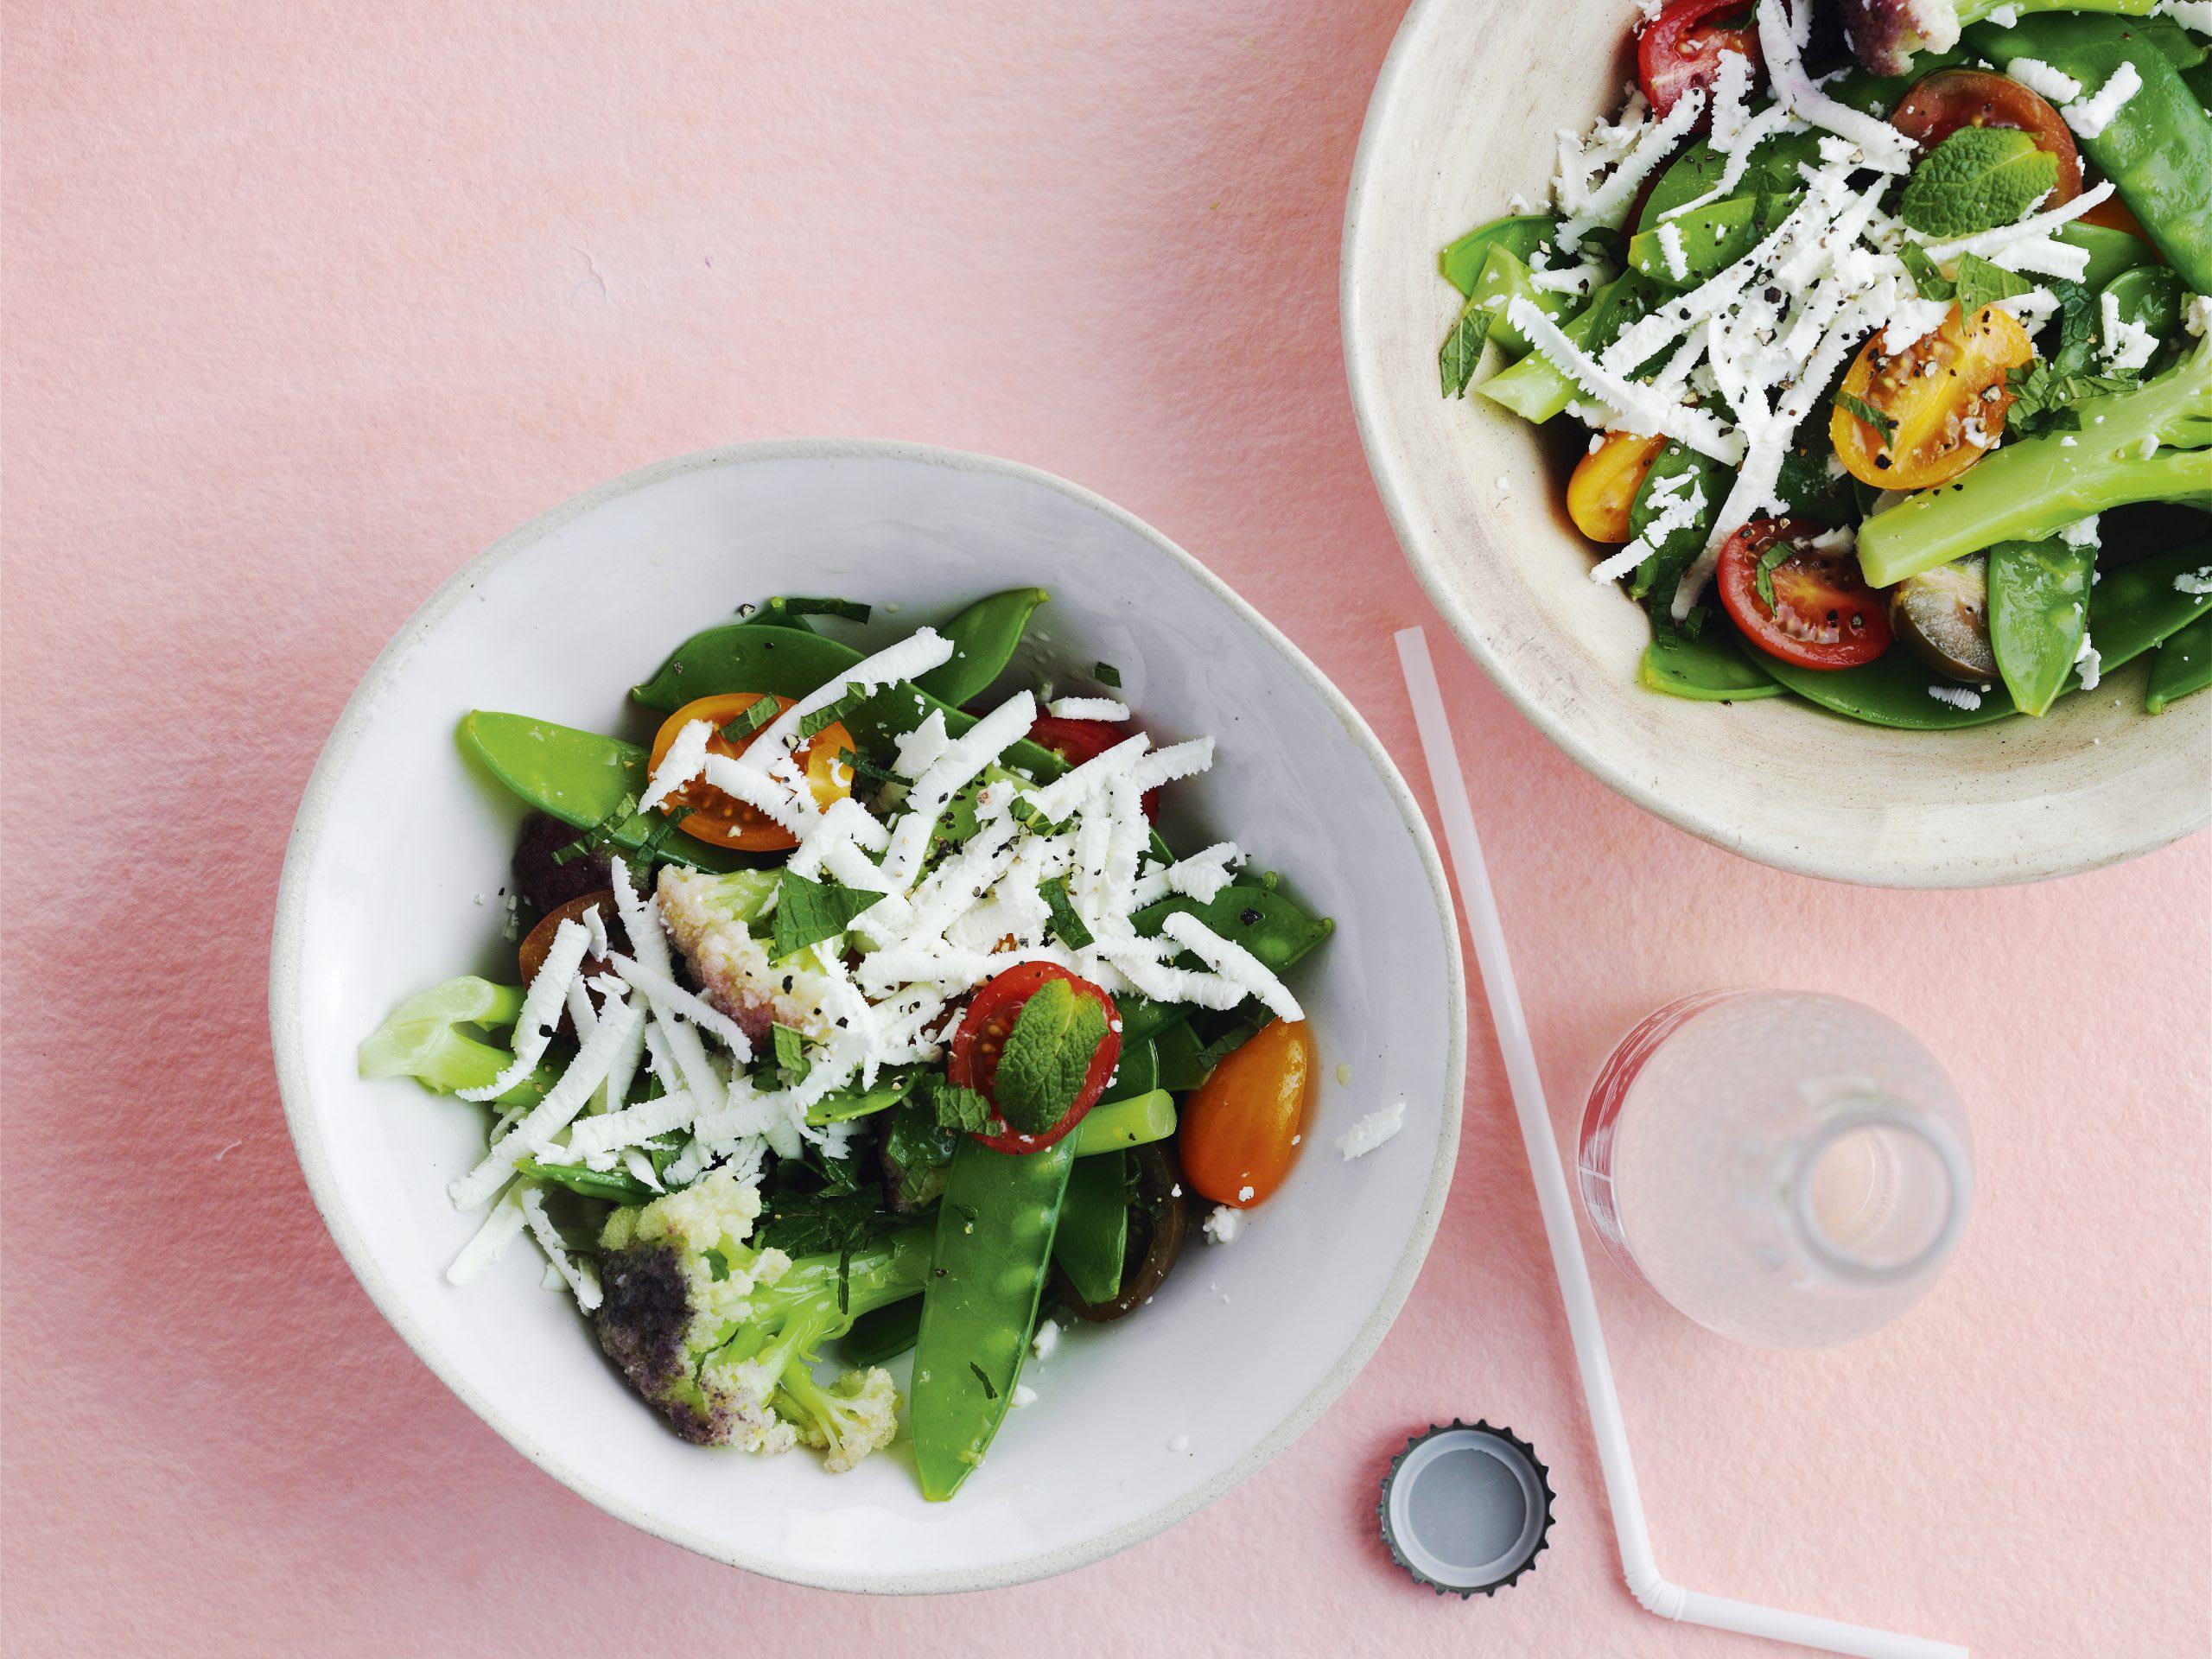 Bunter Salat mit Frischkäse